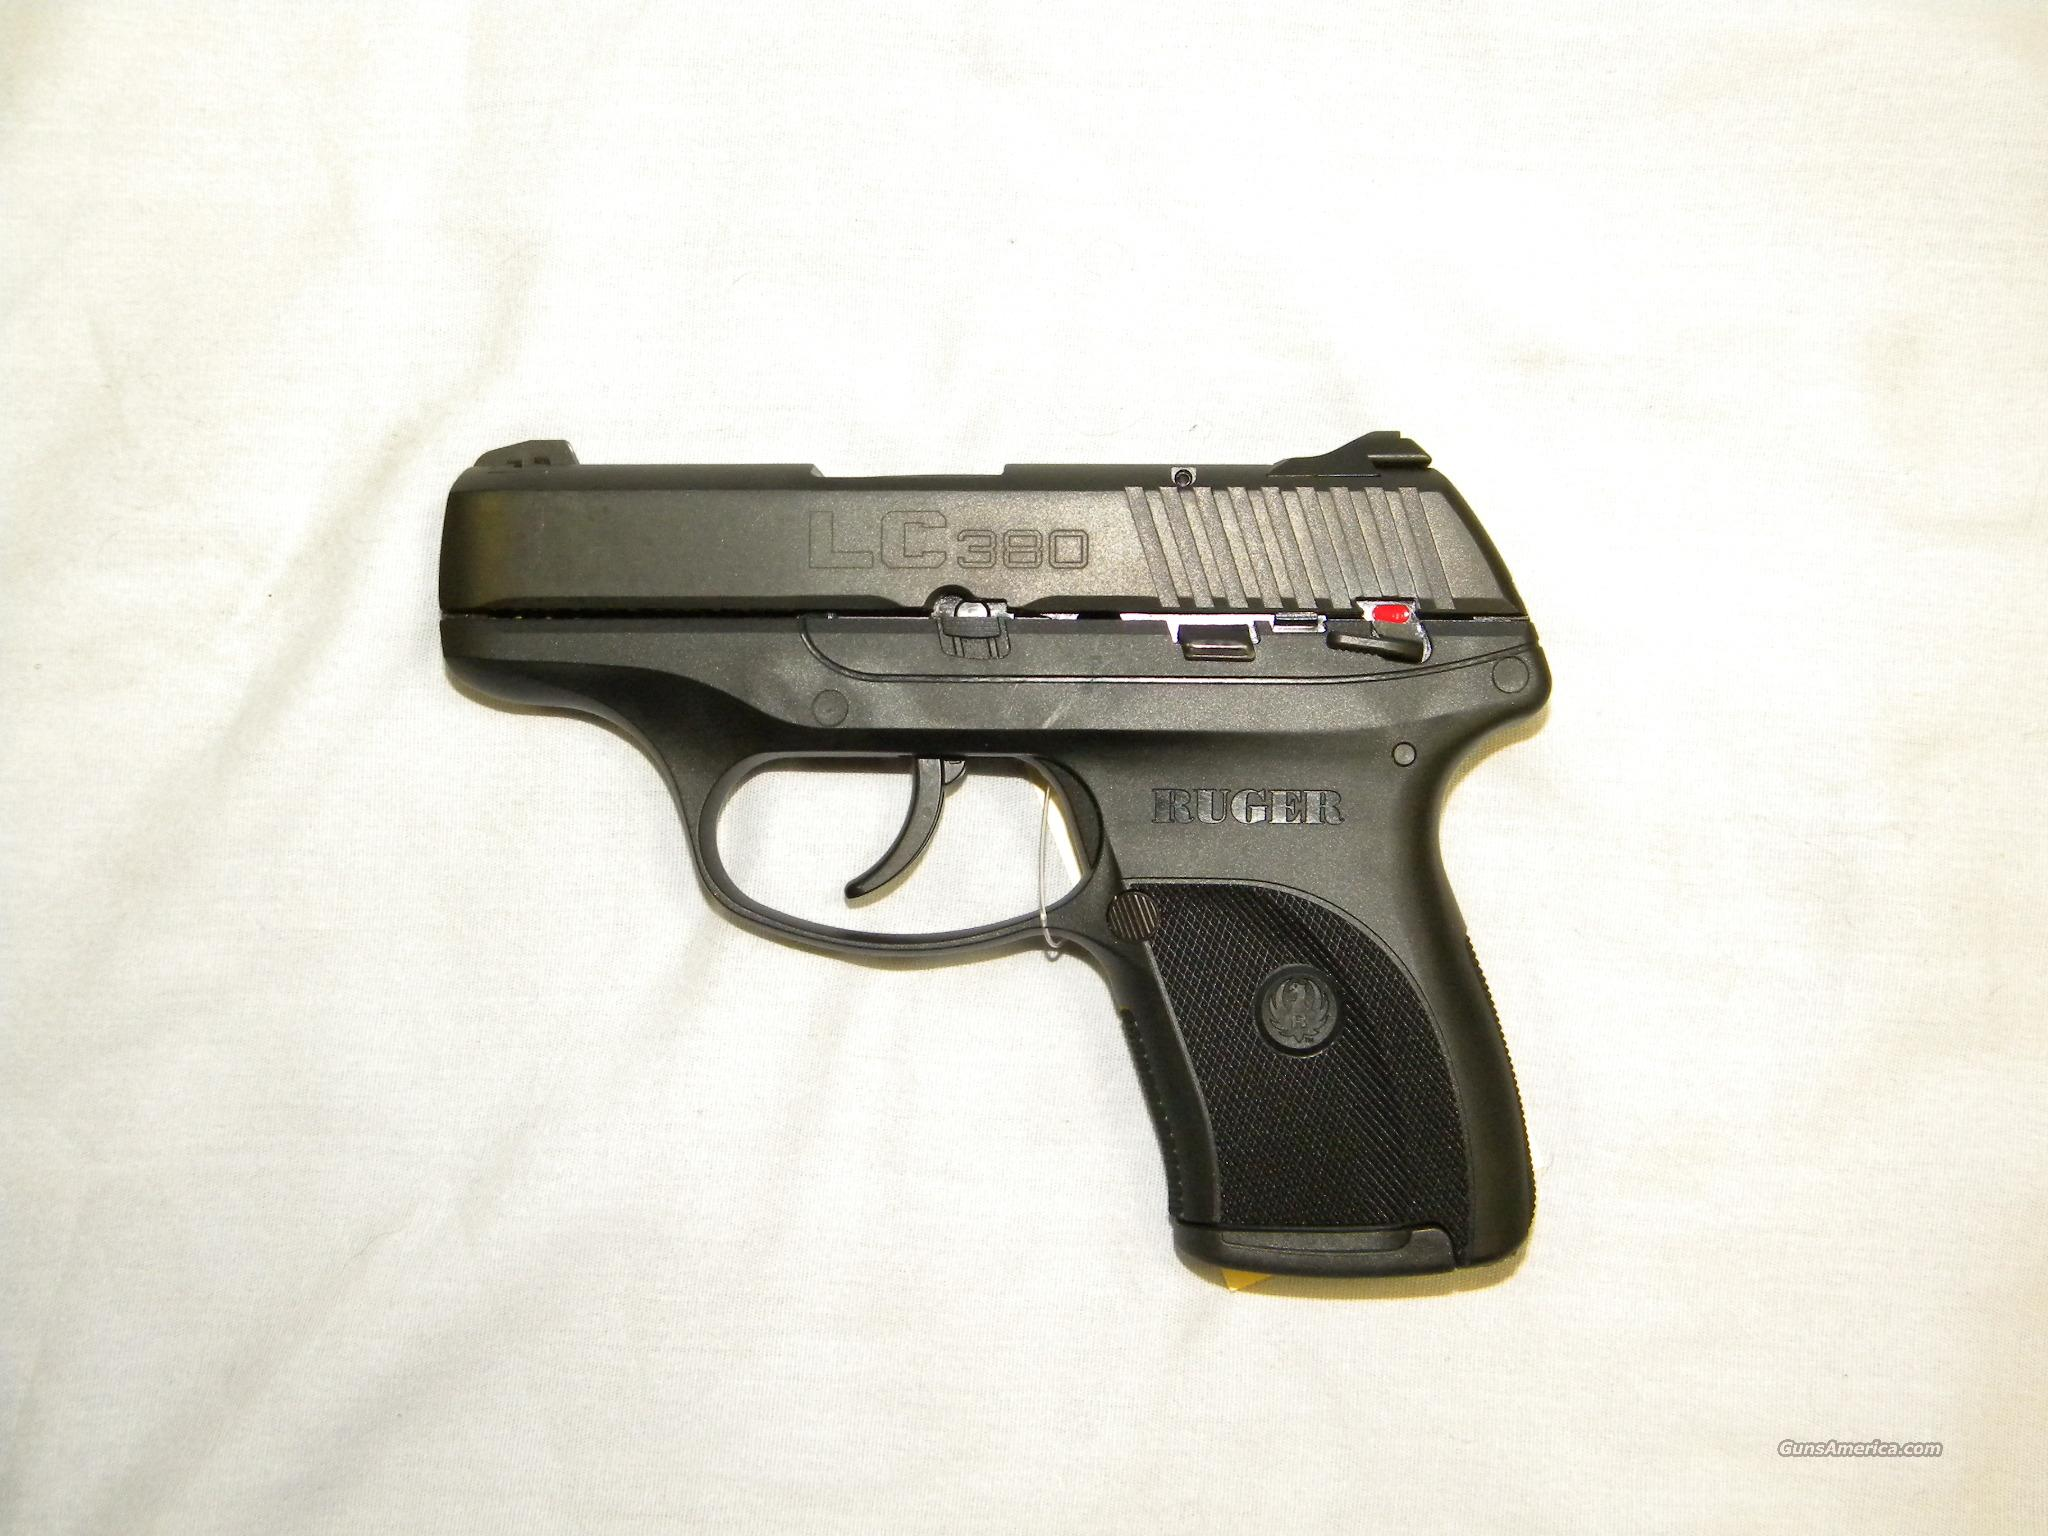 Ruger LC-380, .380 ACP  Guns > Pistols > Ruger Semi-Auto Pistols > LCP